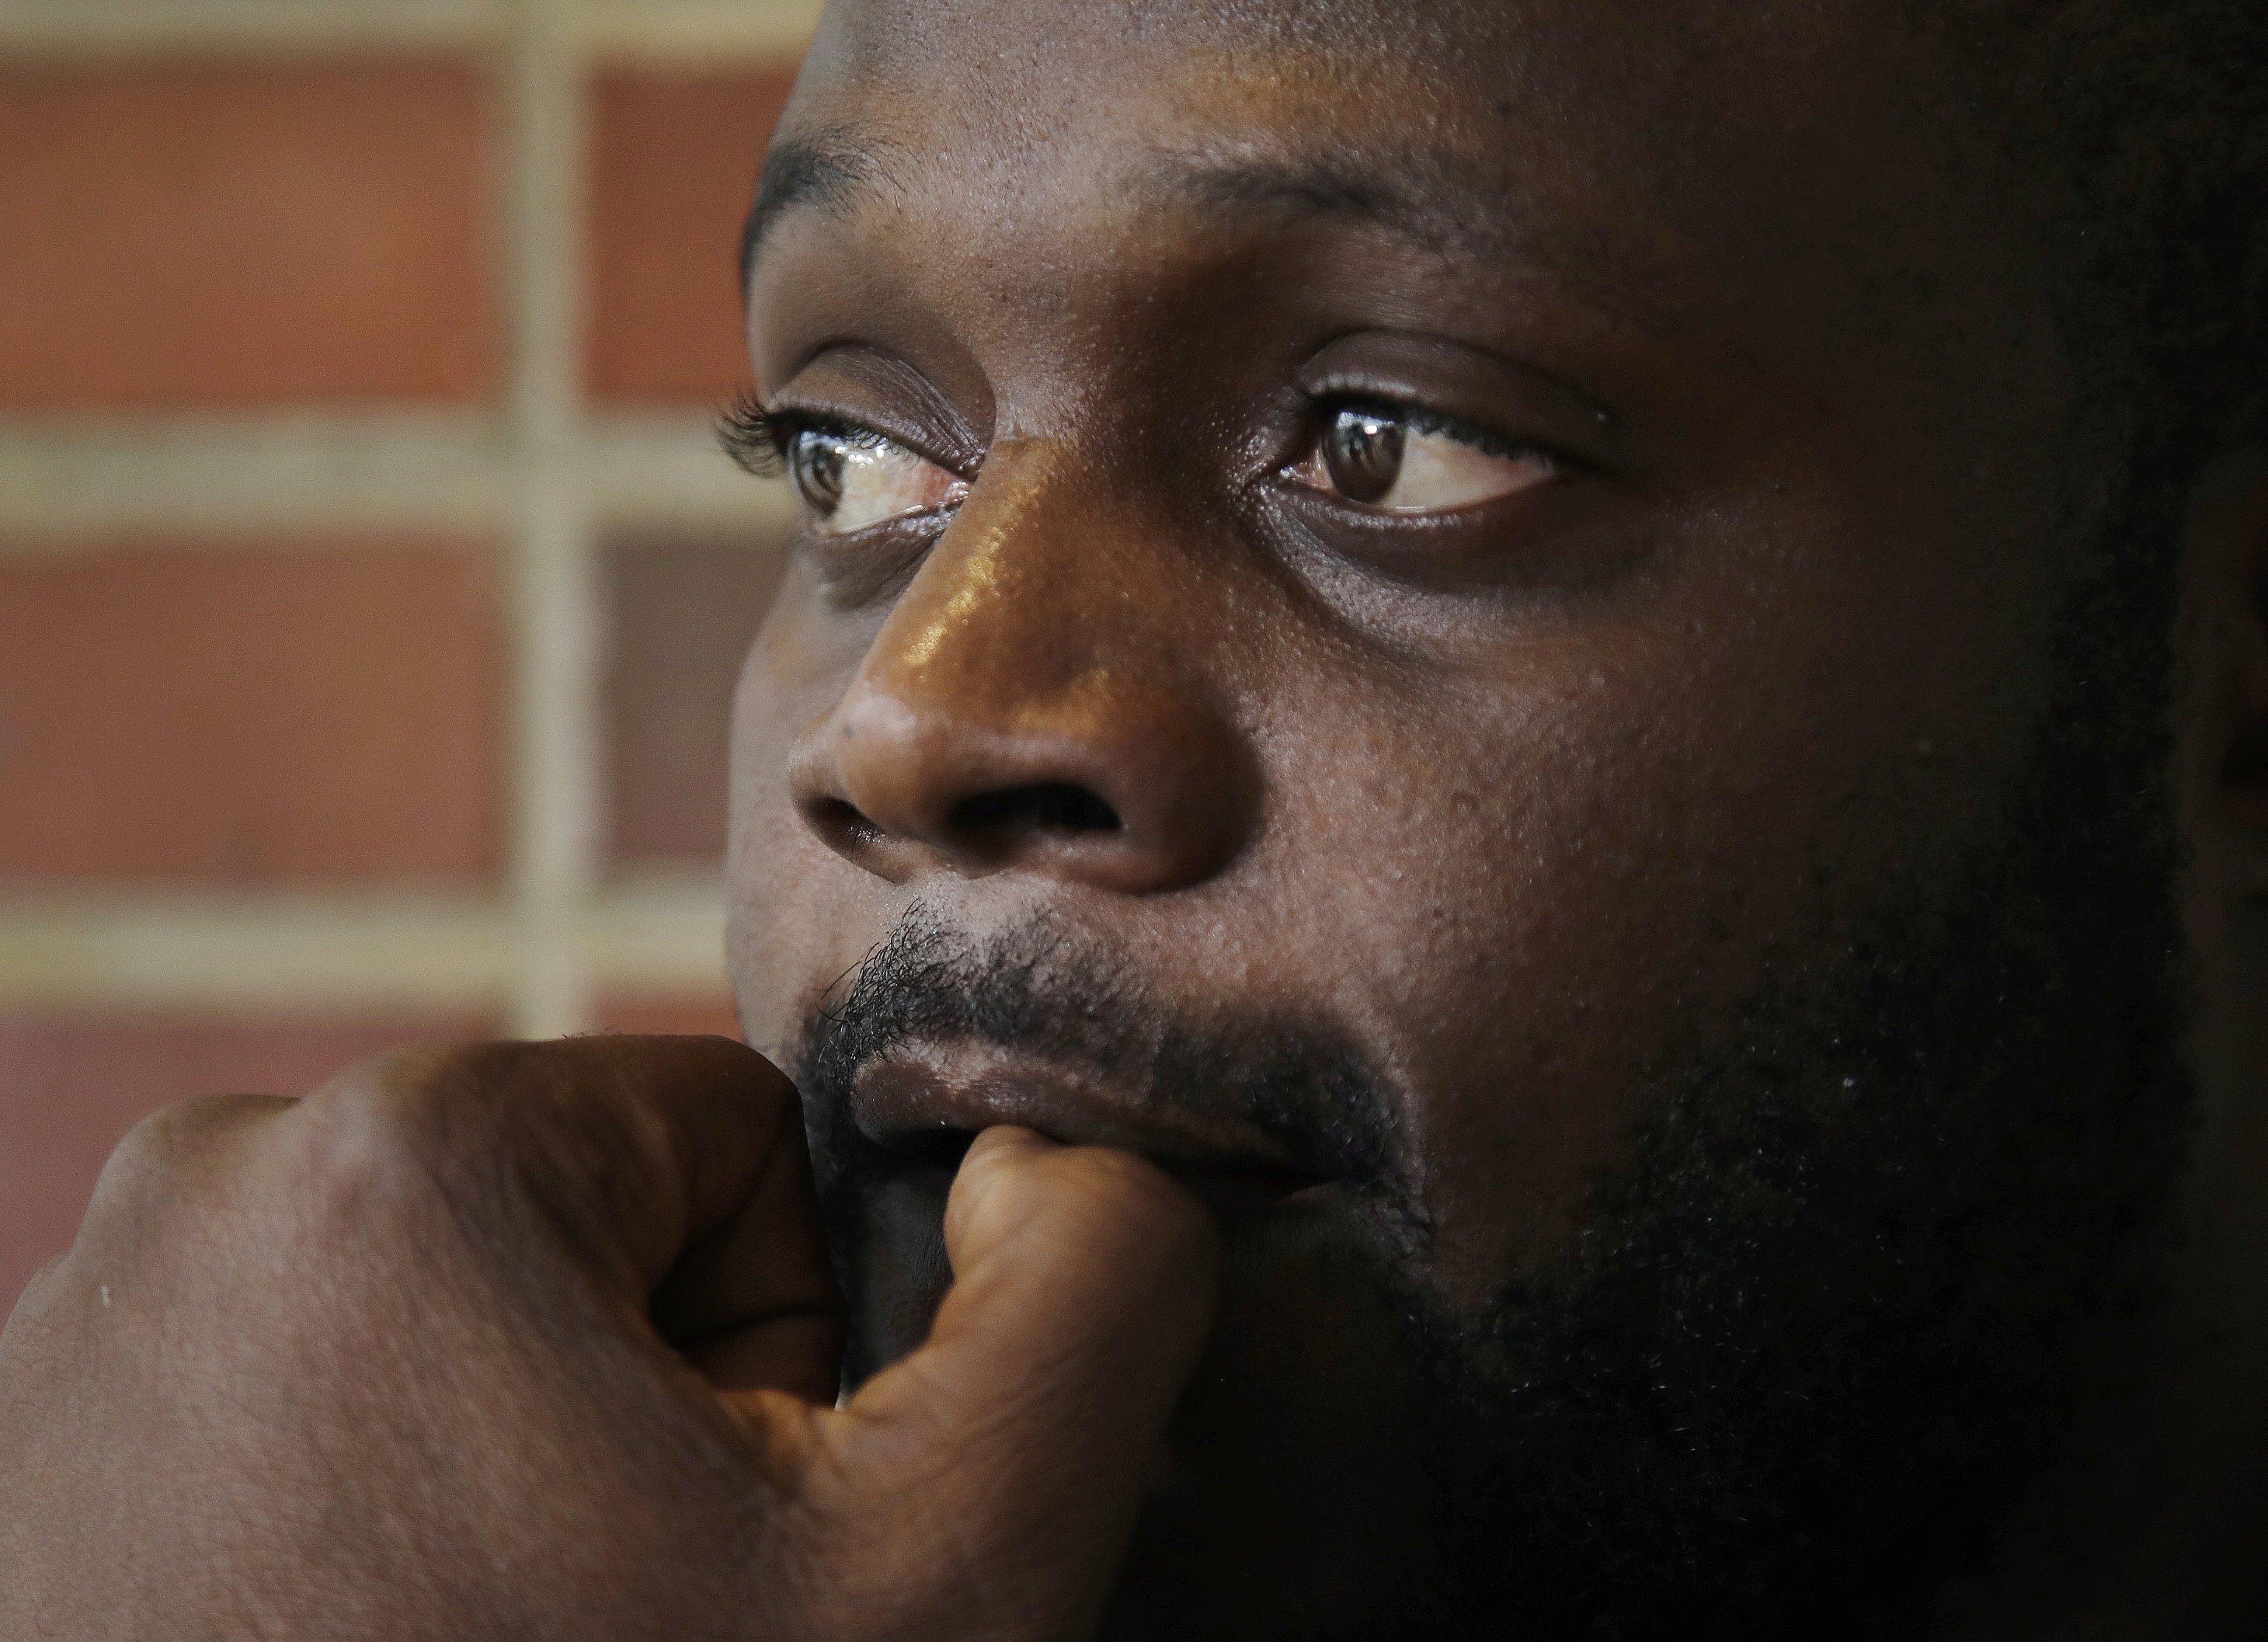 African man escaped a massacre, but death followed